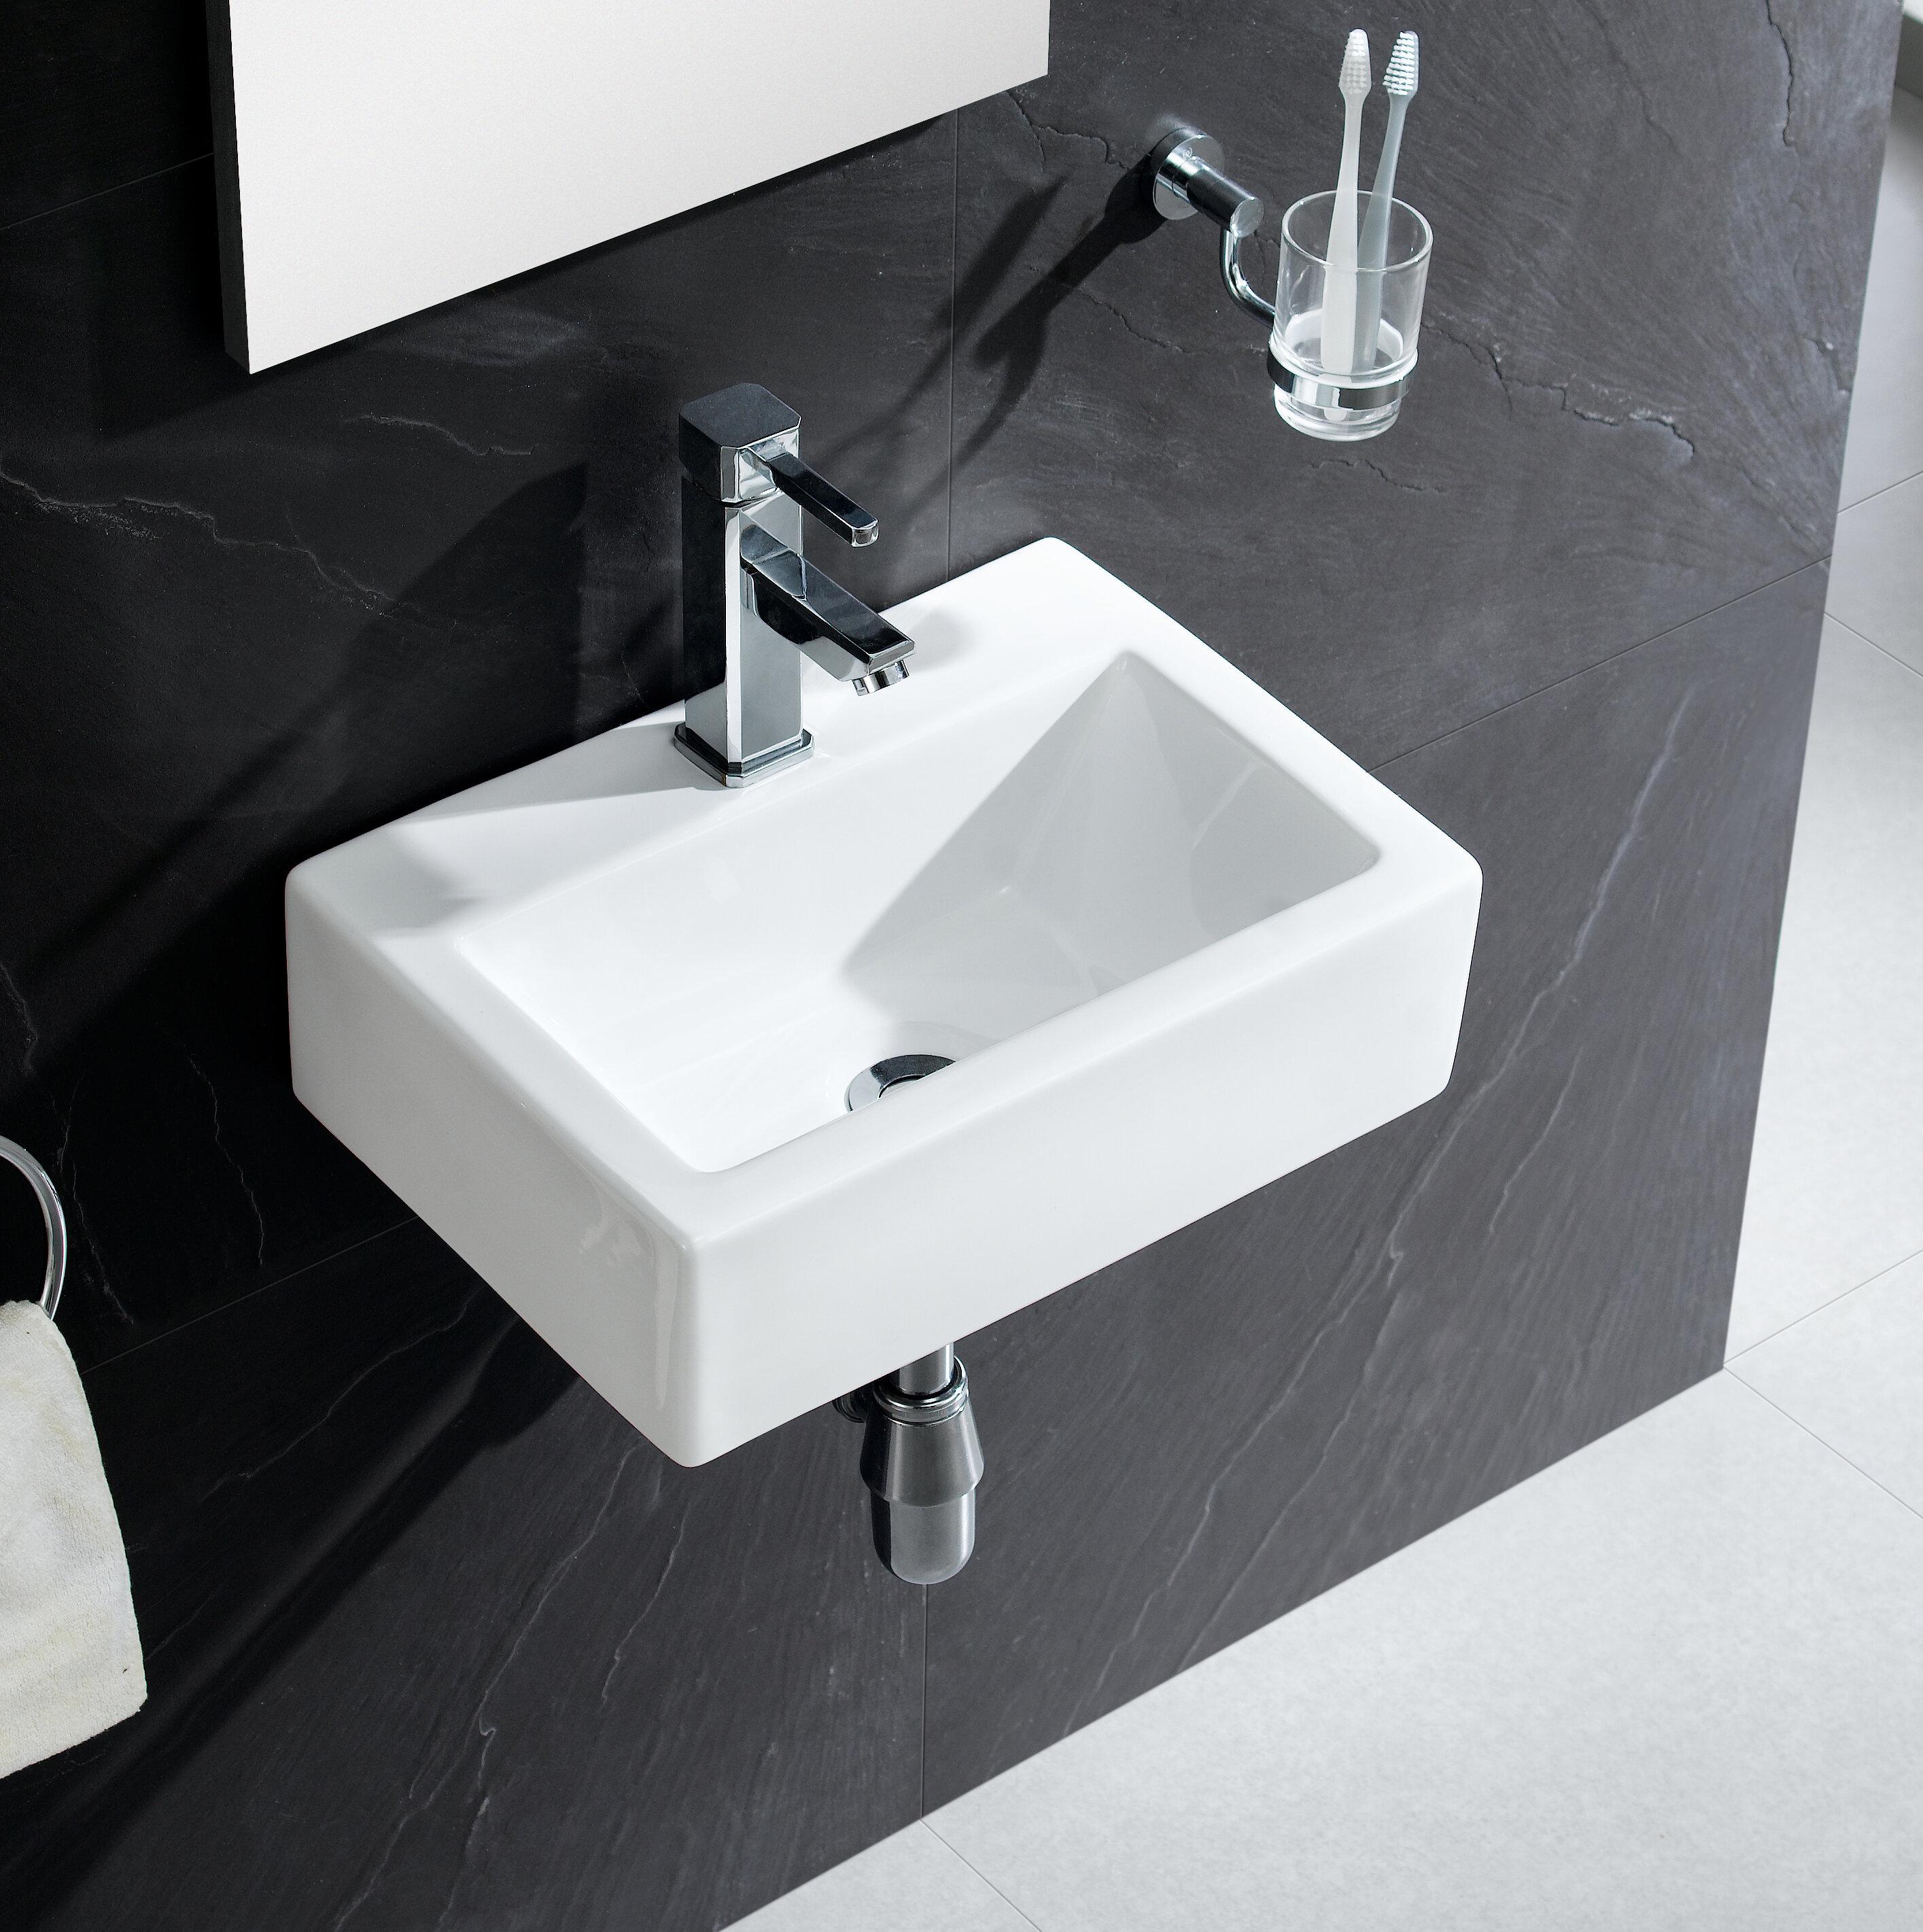 Fine Fixtures Vitreous China Rectangular Wall Mount Bathroom Sink Reviews Wayfair Ca